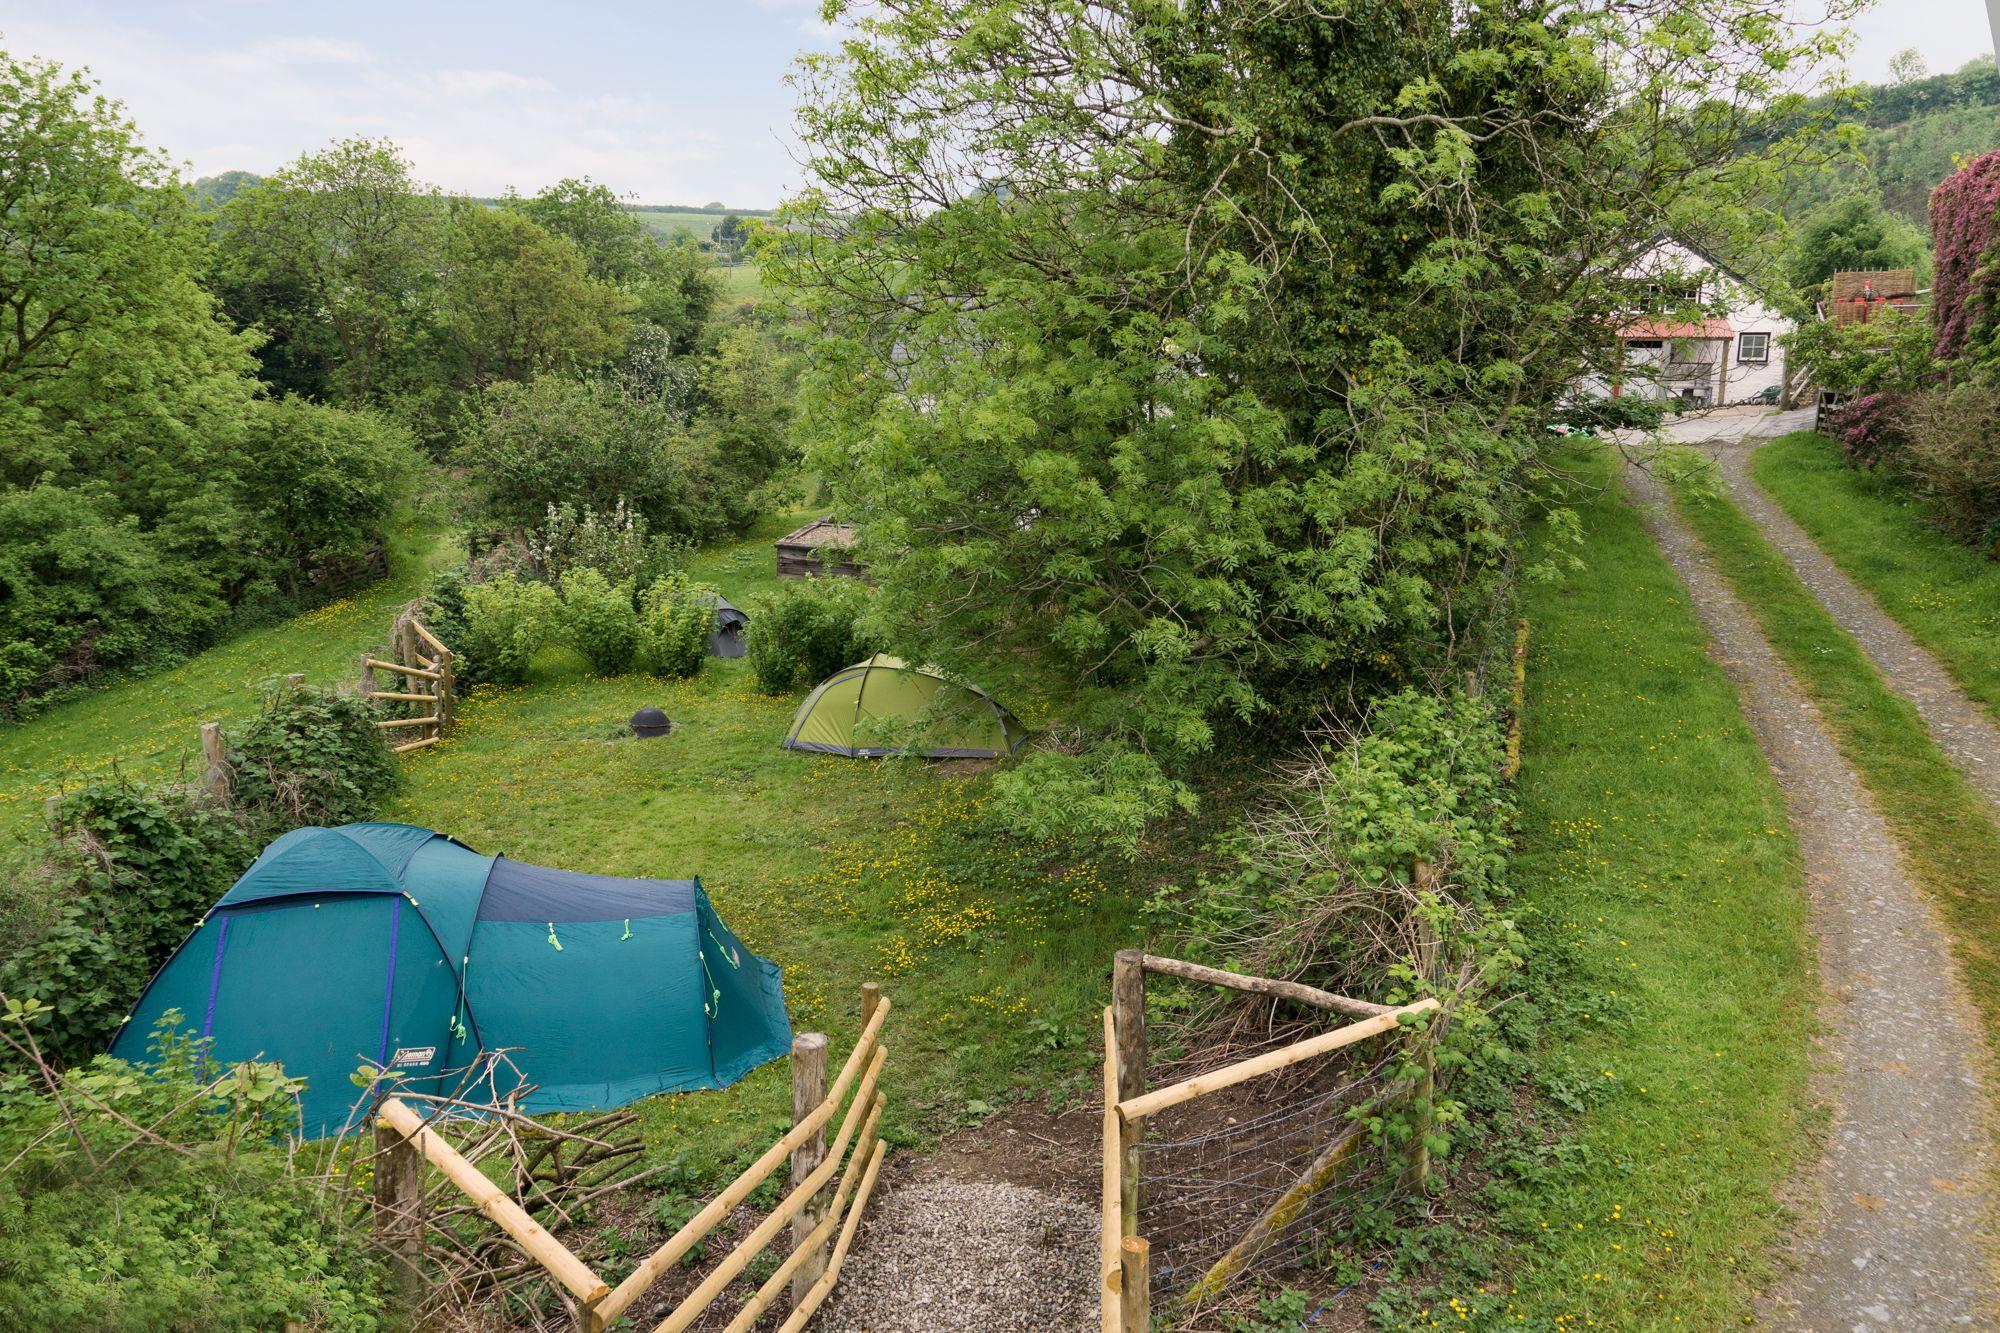 Campsites in Coed-y-Bryn – Glampingly